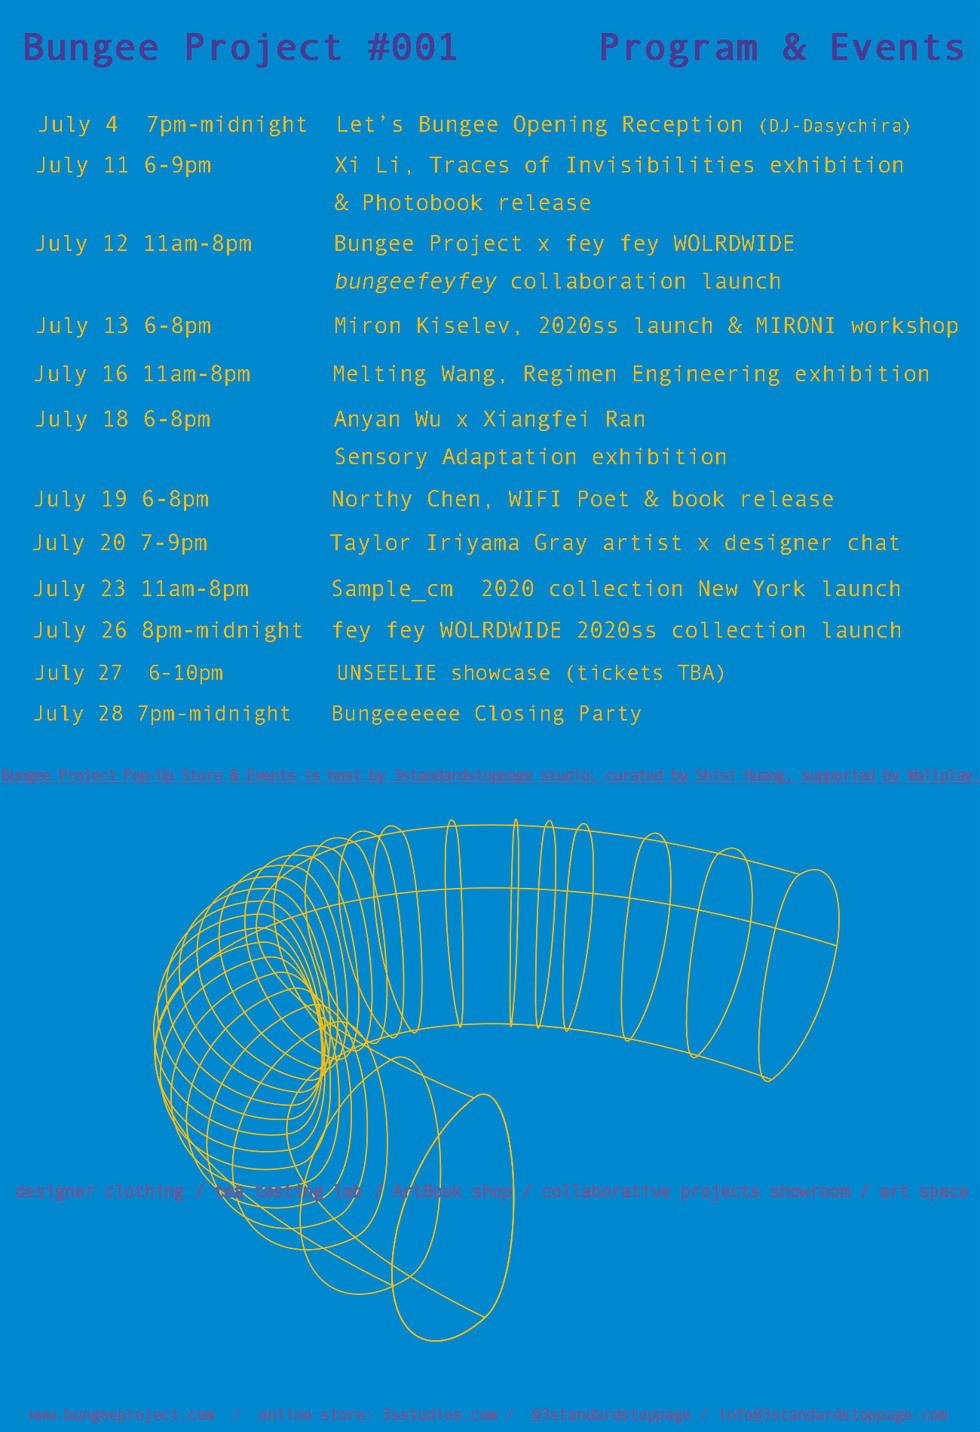 events schedule poster.jpg